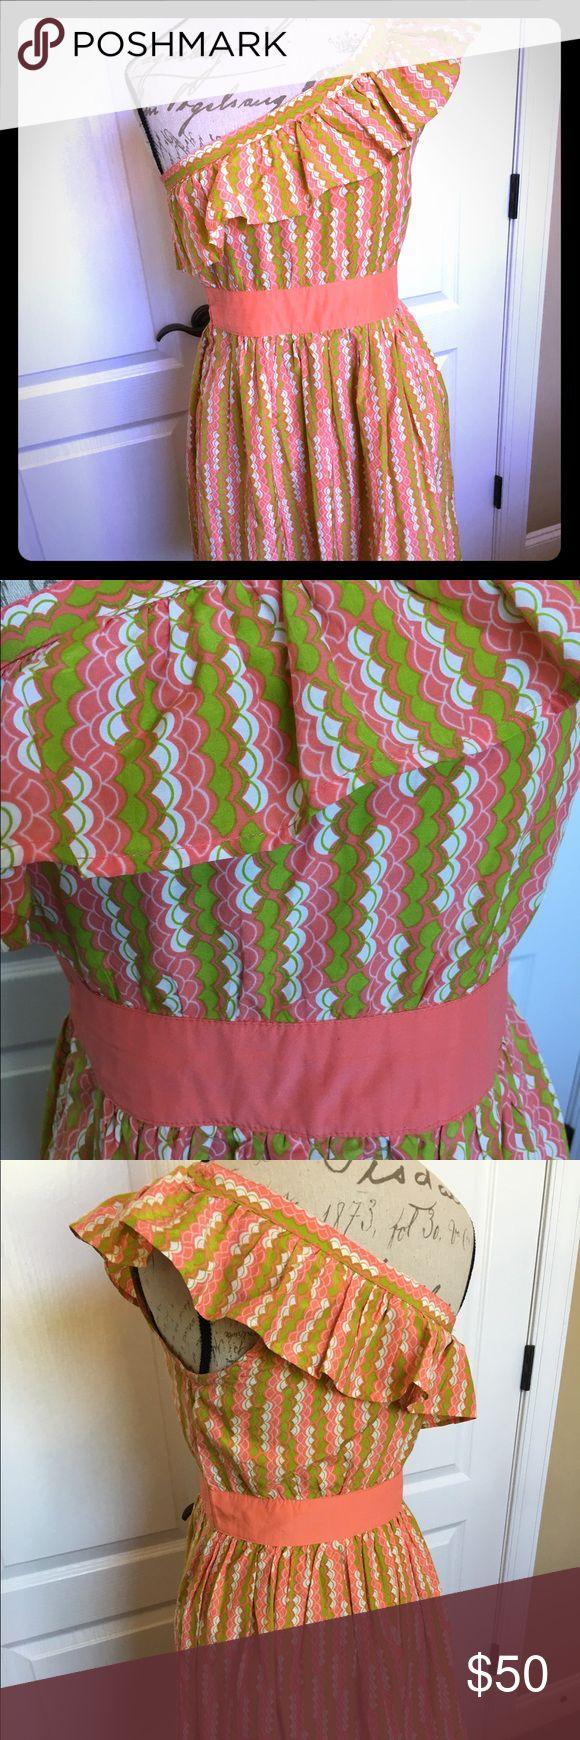 Off shoulder pink and green dress Tulle dress from Nordstrom's off shoulder pink & green perfect for summer. Tulle Dresses Midi